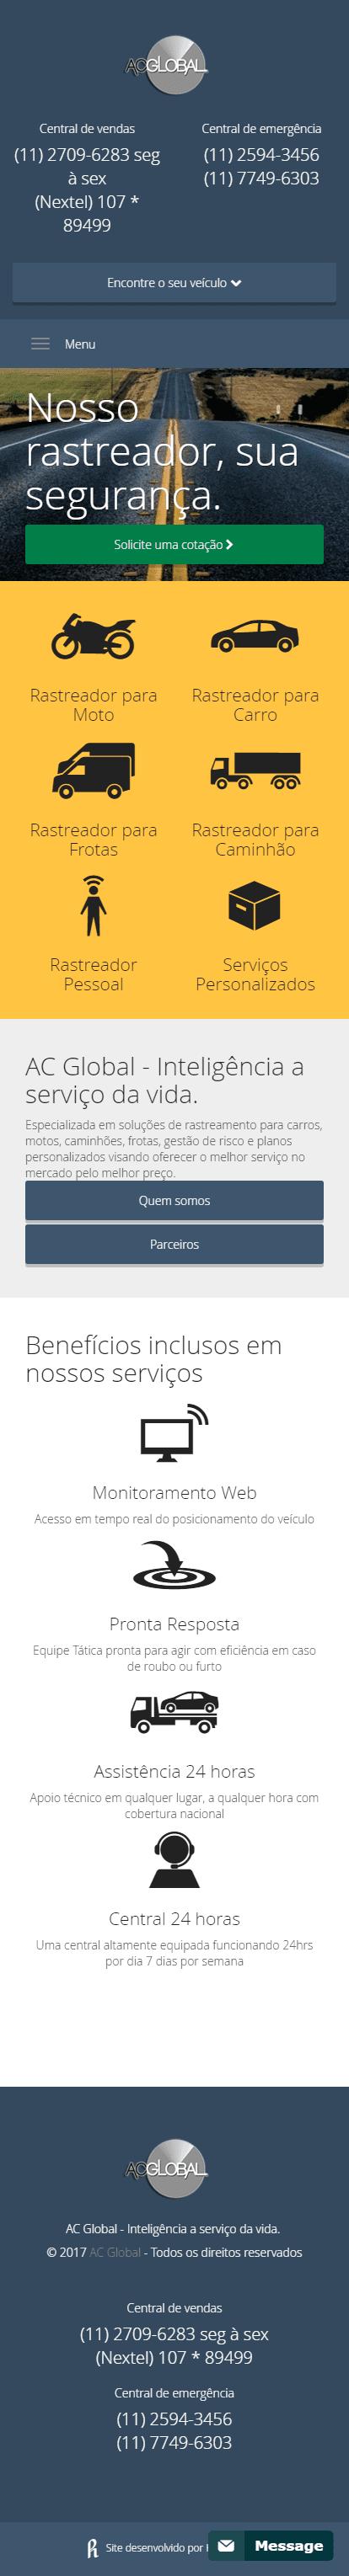 www.acglobal.com.br-(iPhone 6 Plus)